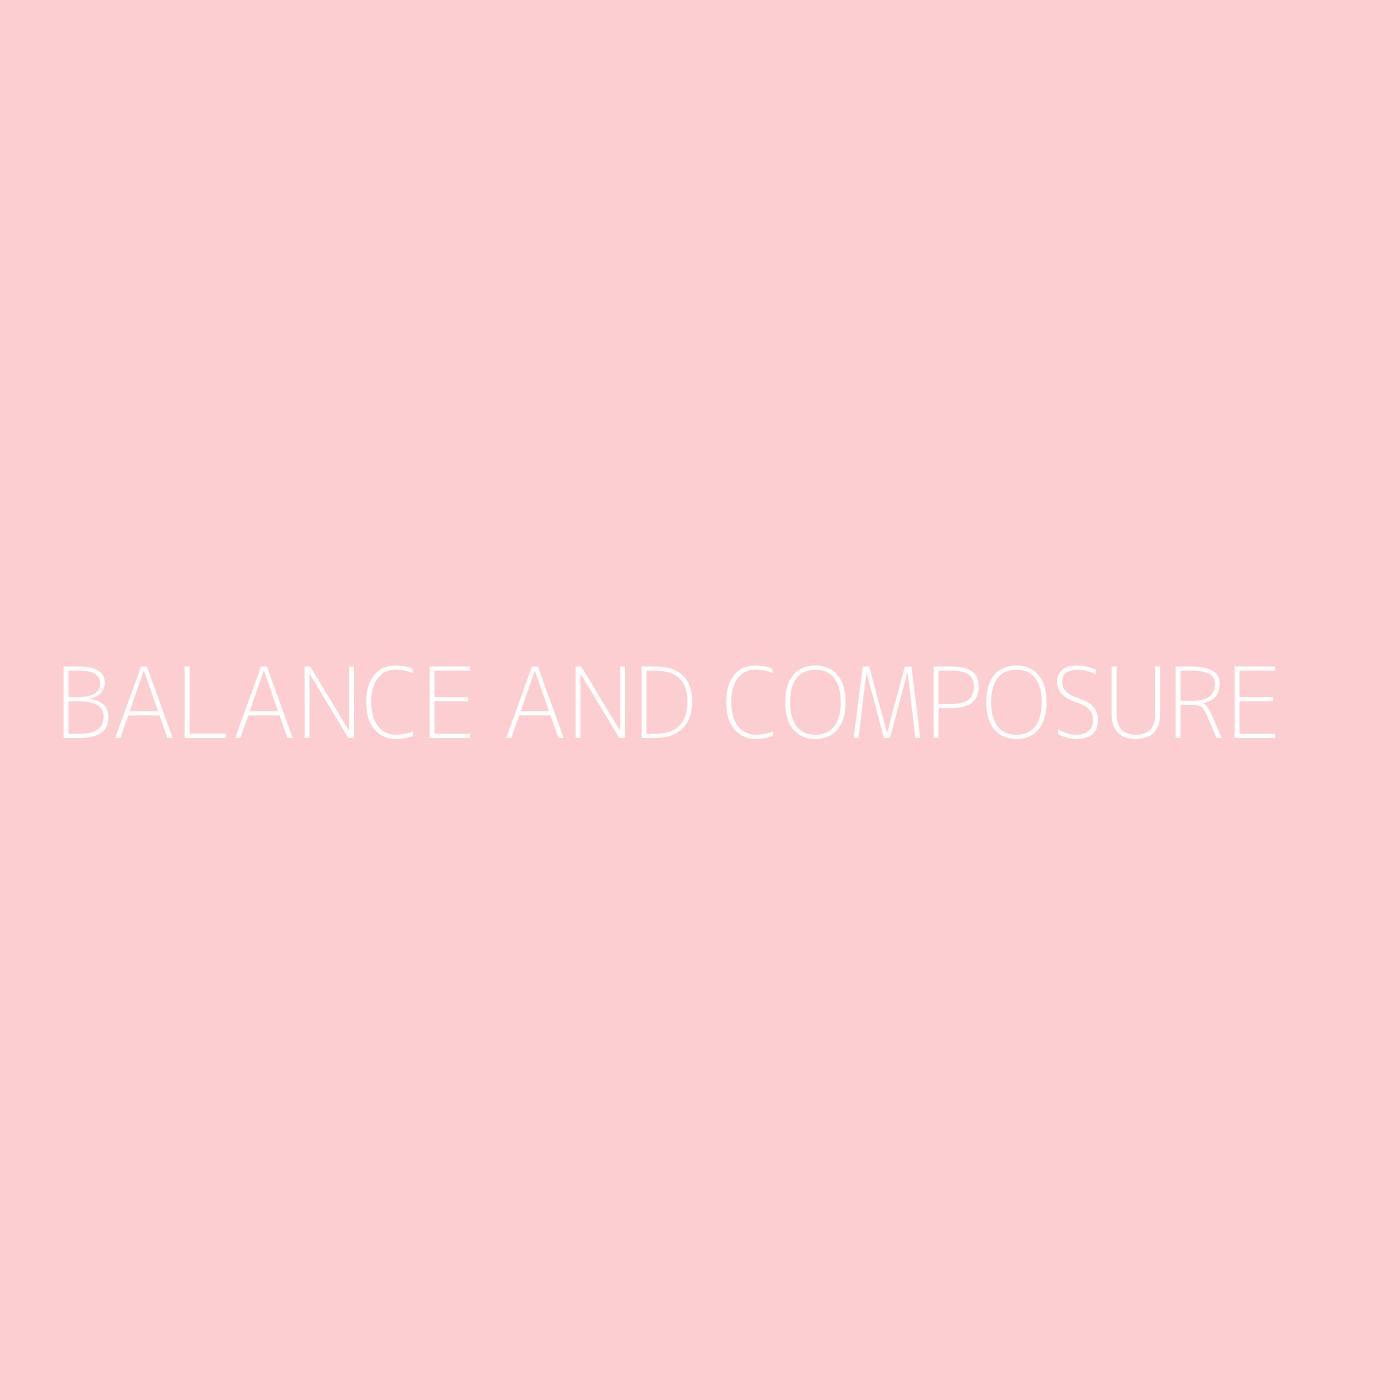 Balance And Composure Playlist Artwork